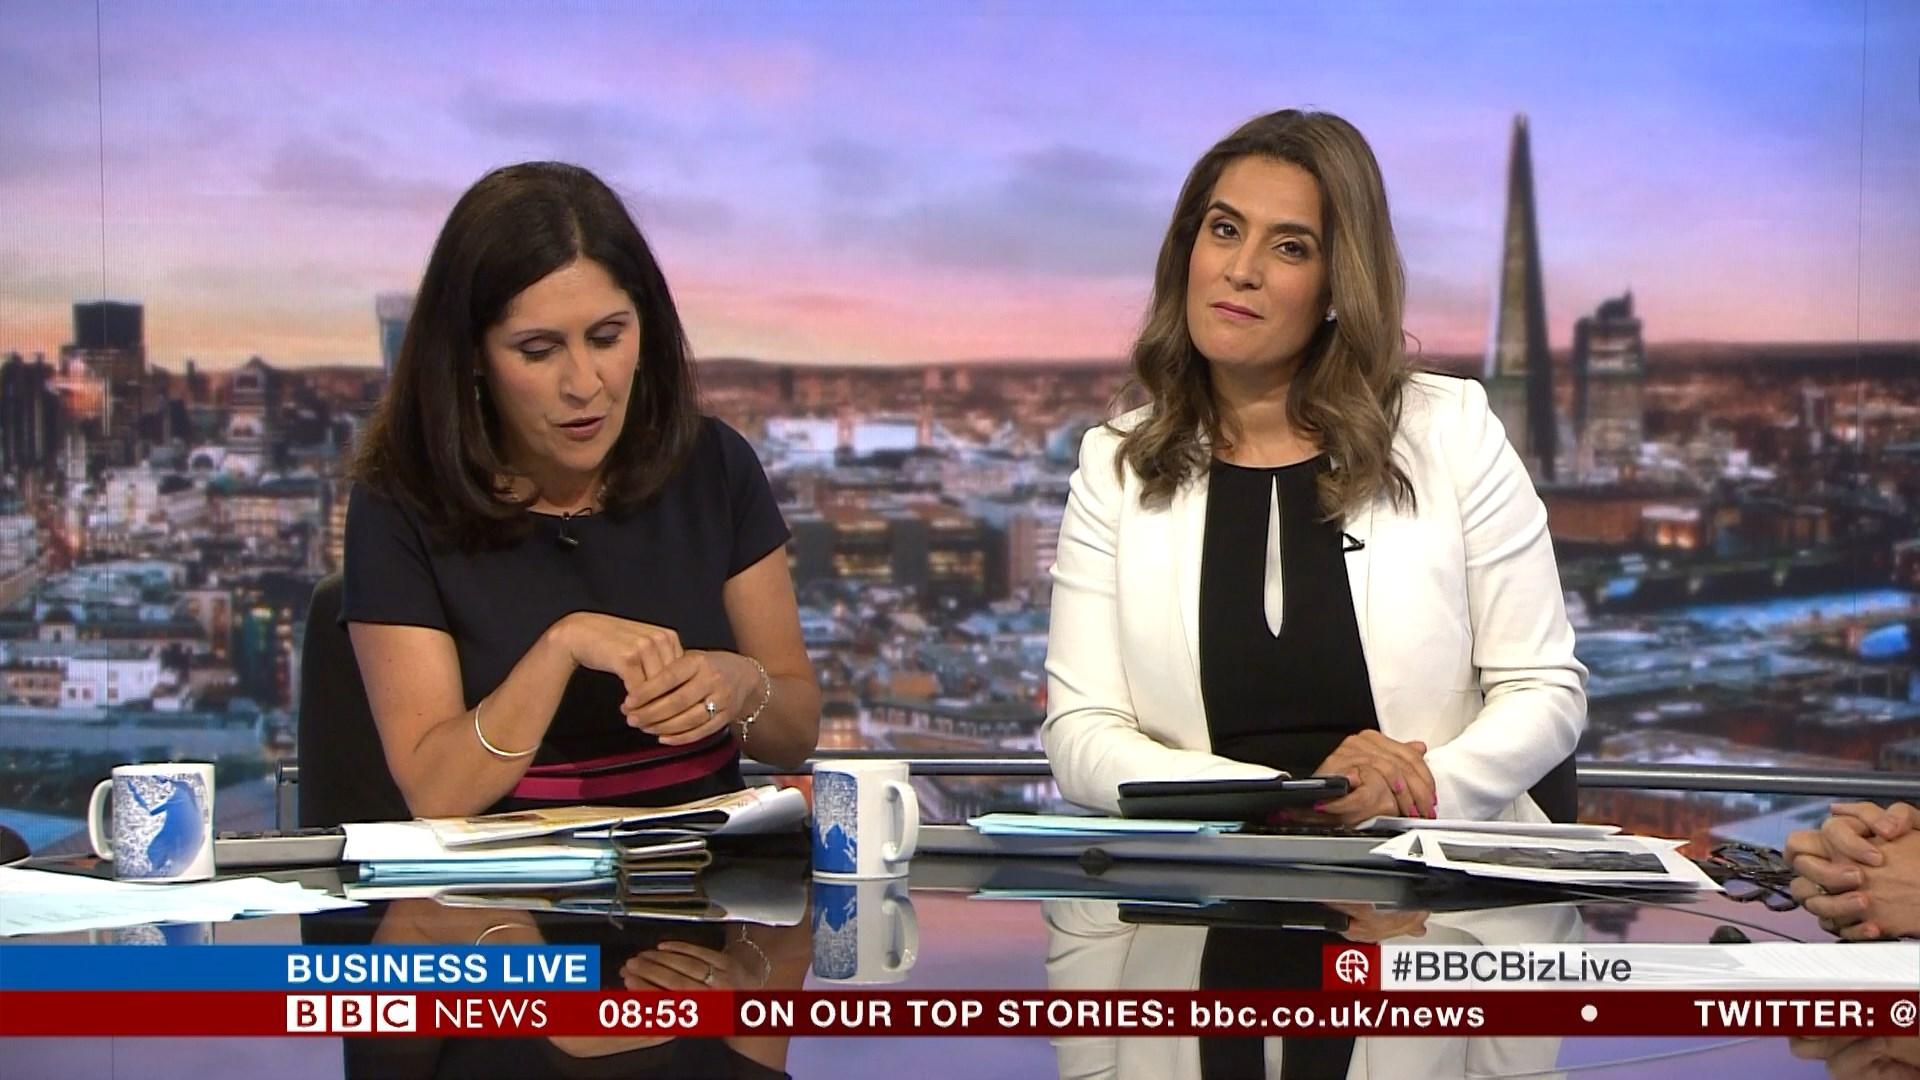 73617436_bbc-business-live_20180622_08300900-ts_snapshot_24-56_-2018-06-22_11-14-43.jpg